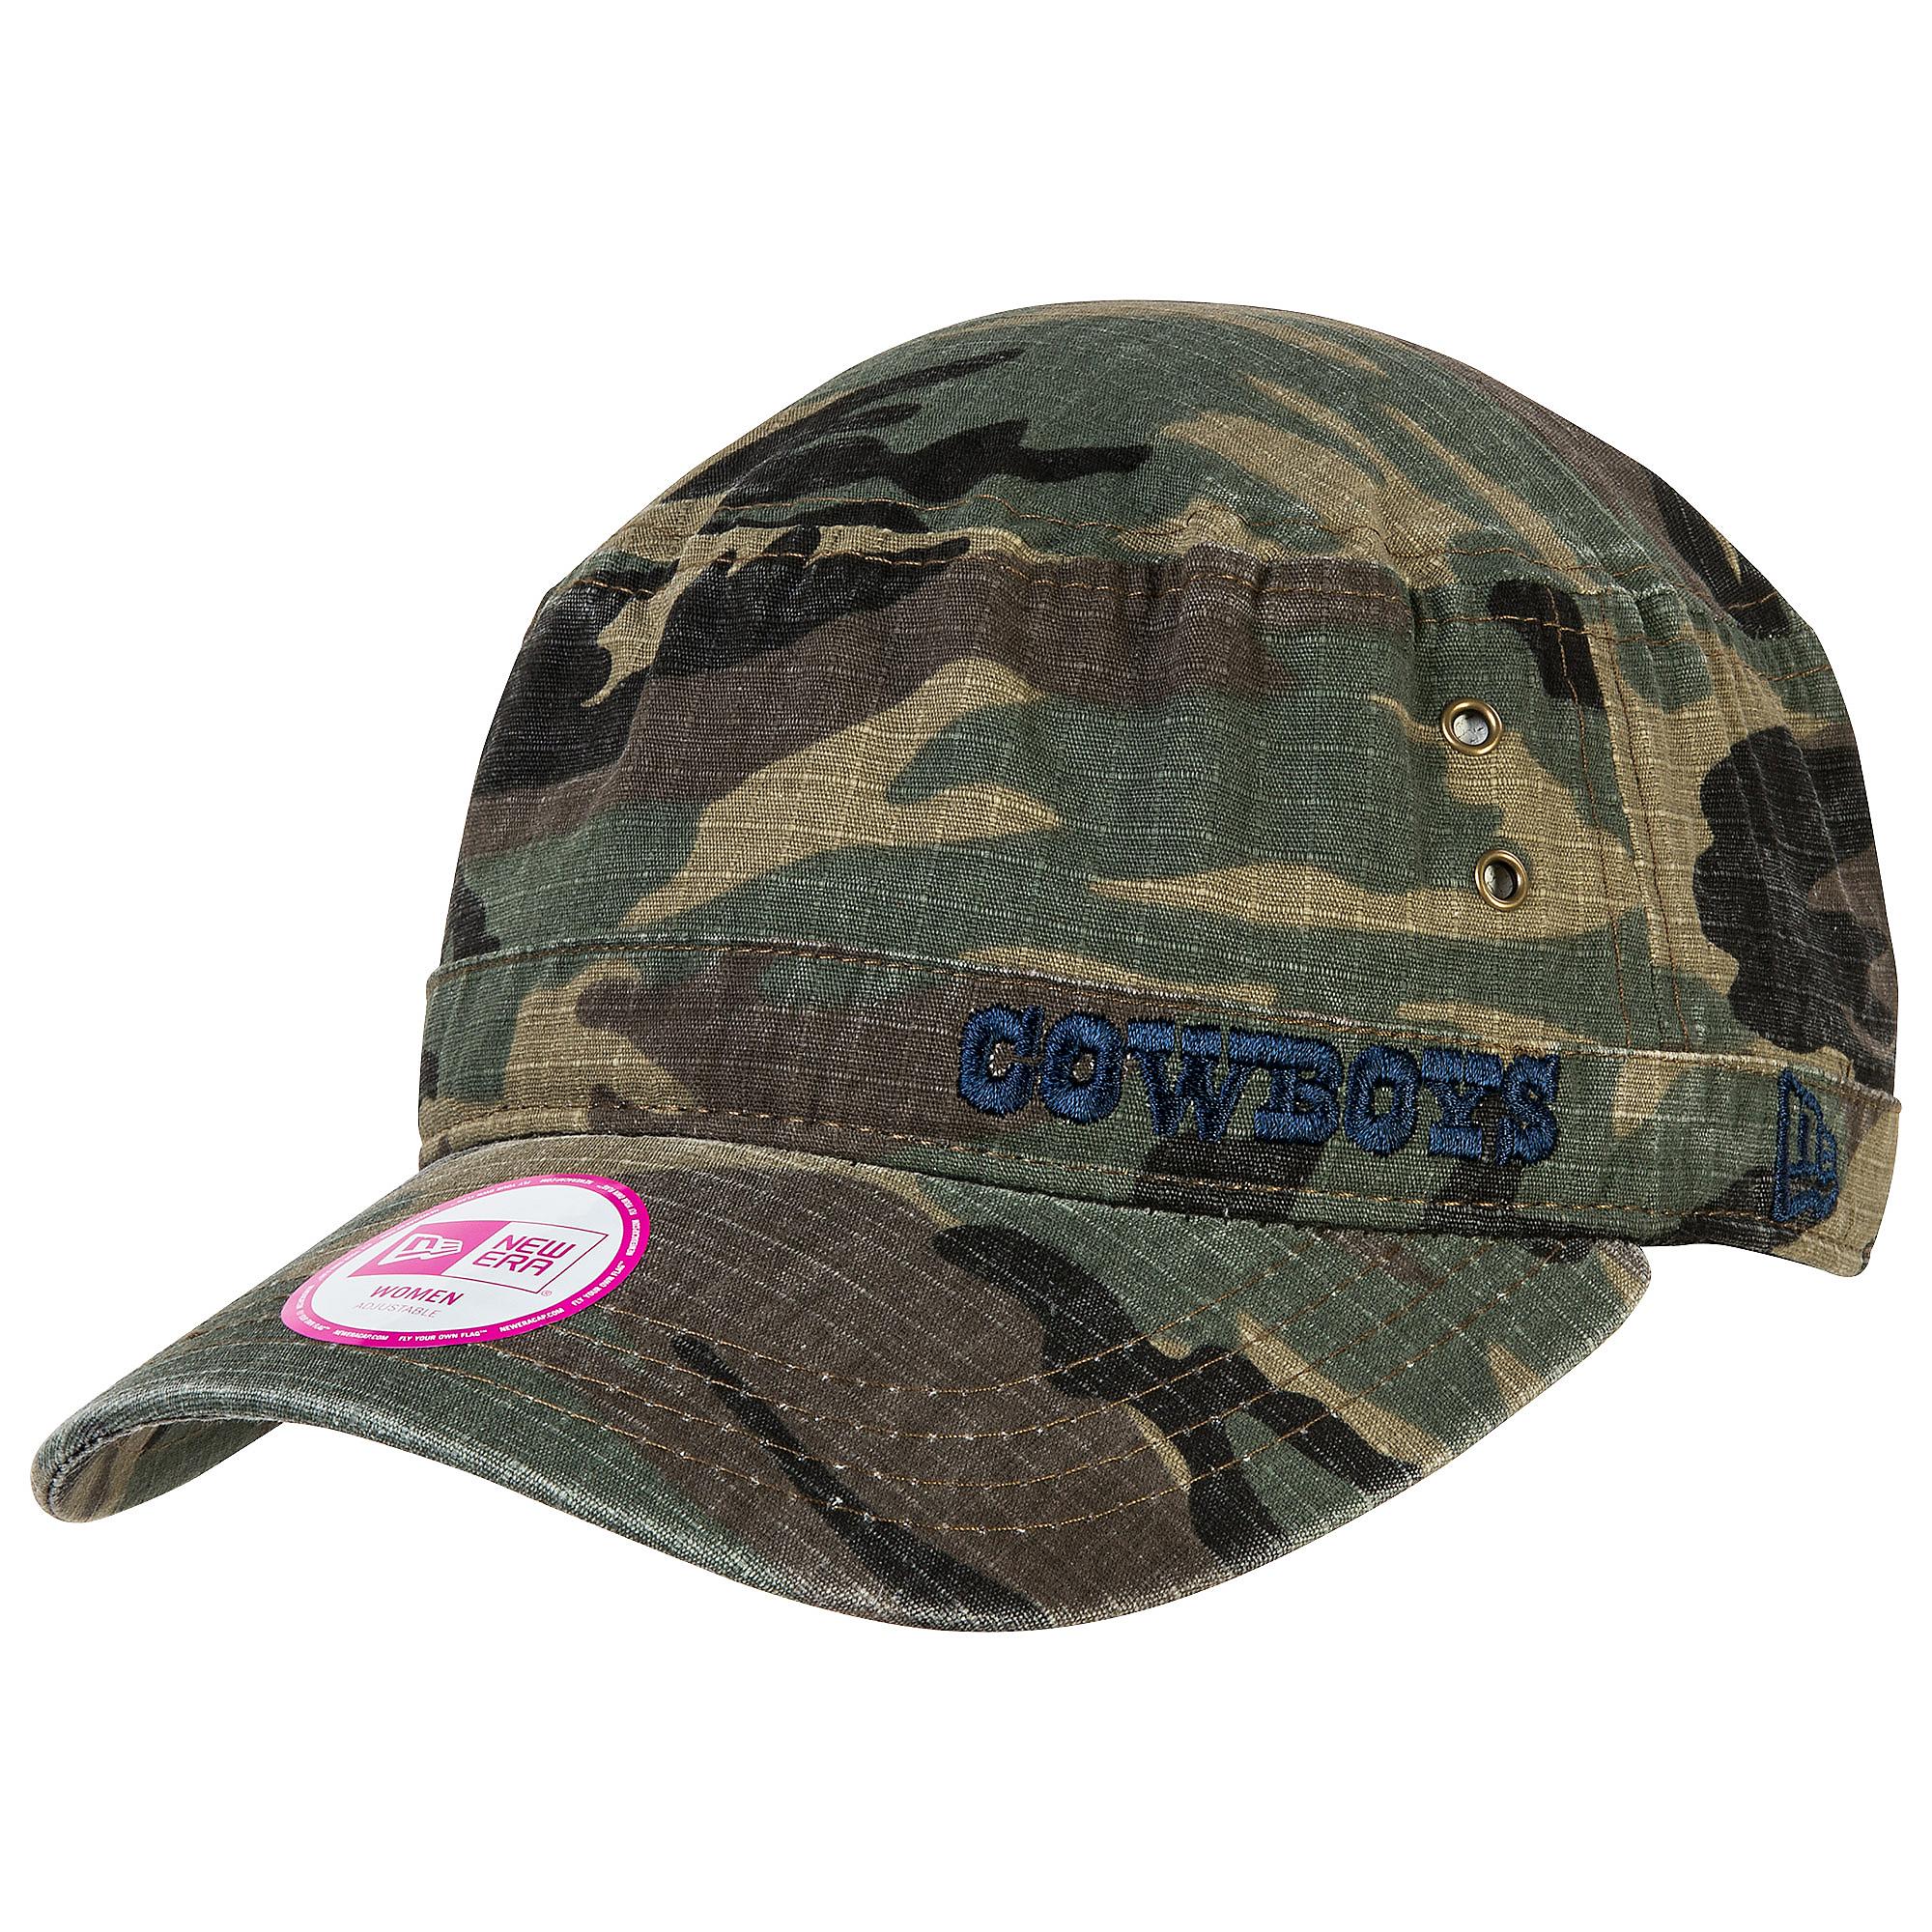 5adcc27b7 real dallas cowboys camouflage cap ddde1 4ff83